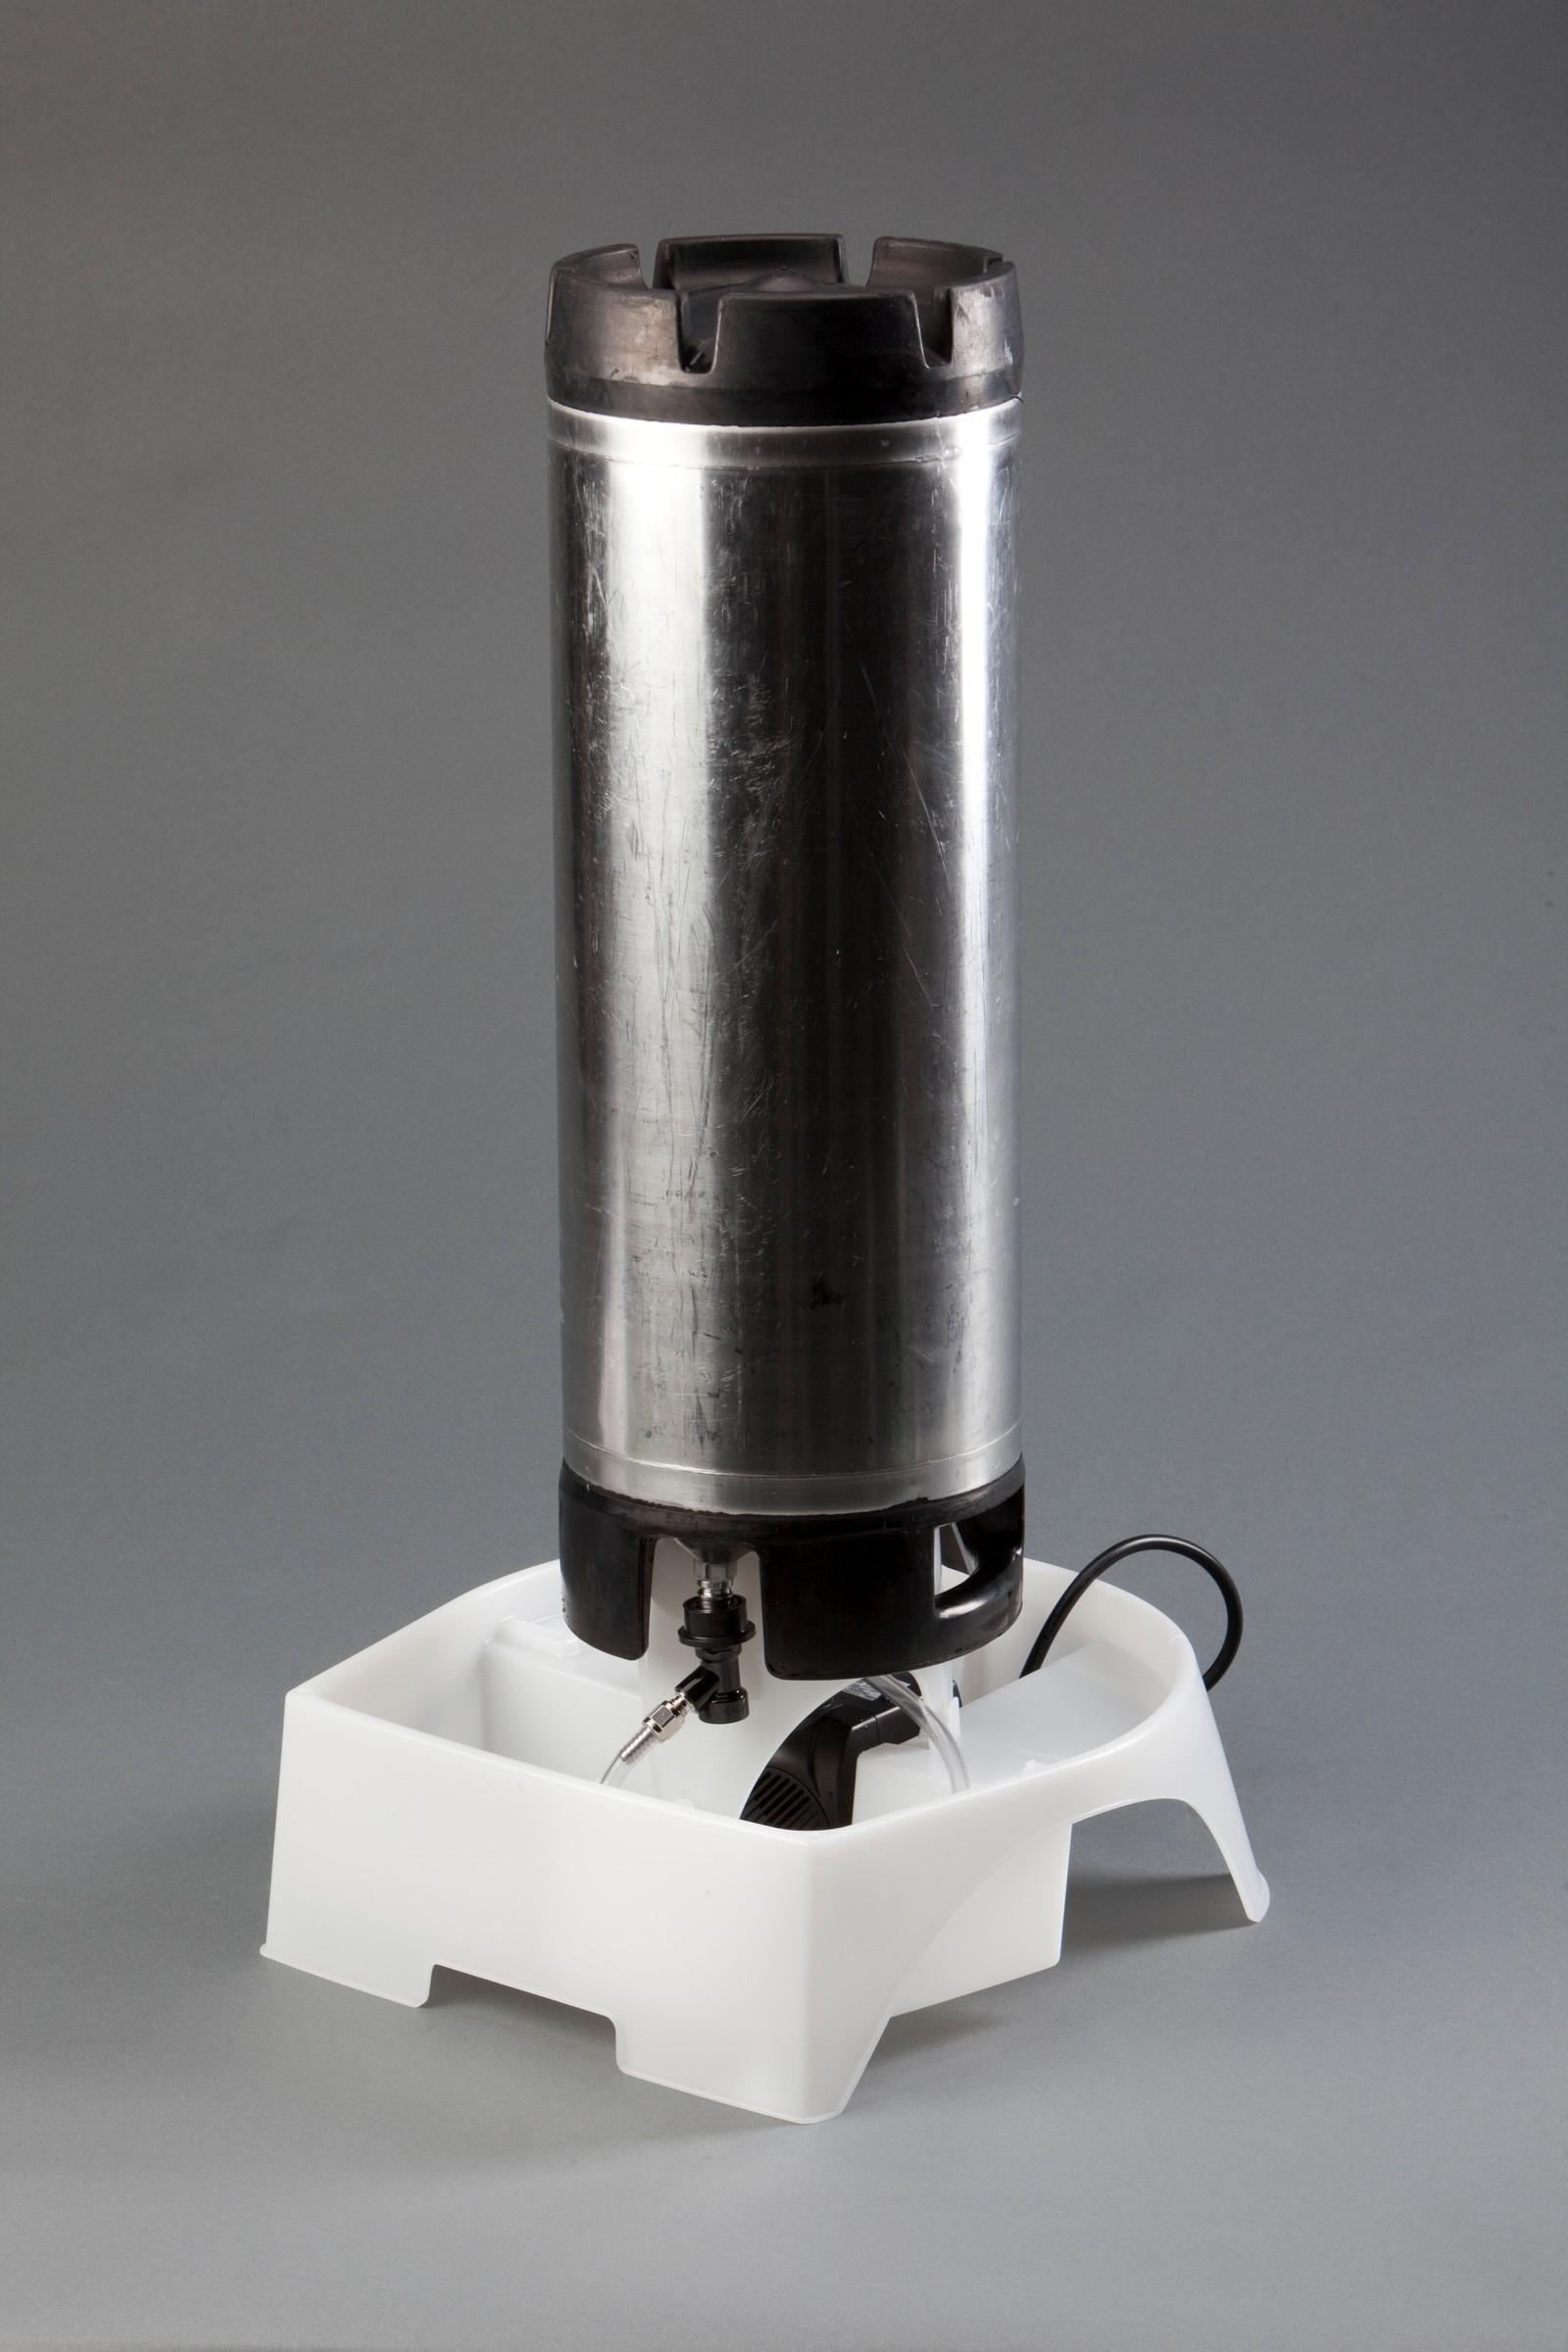 Mark's Keg Washer (Mark II)